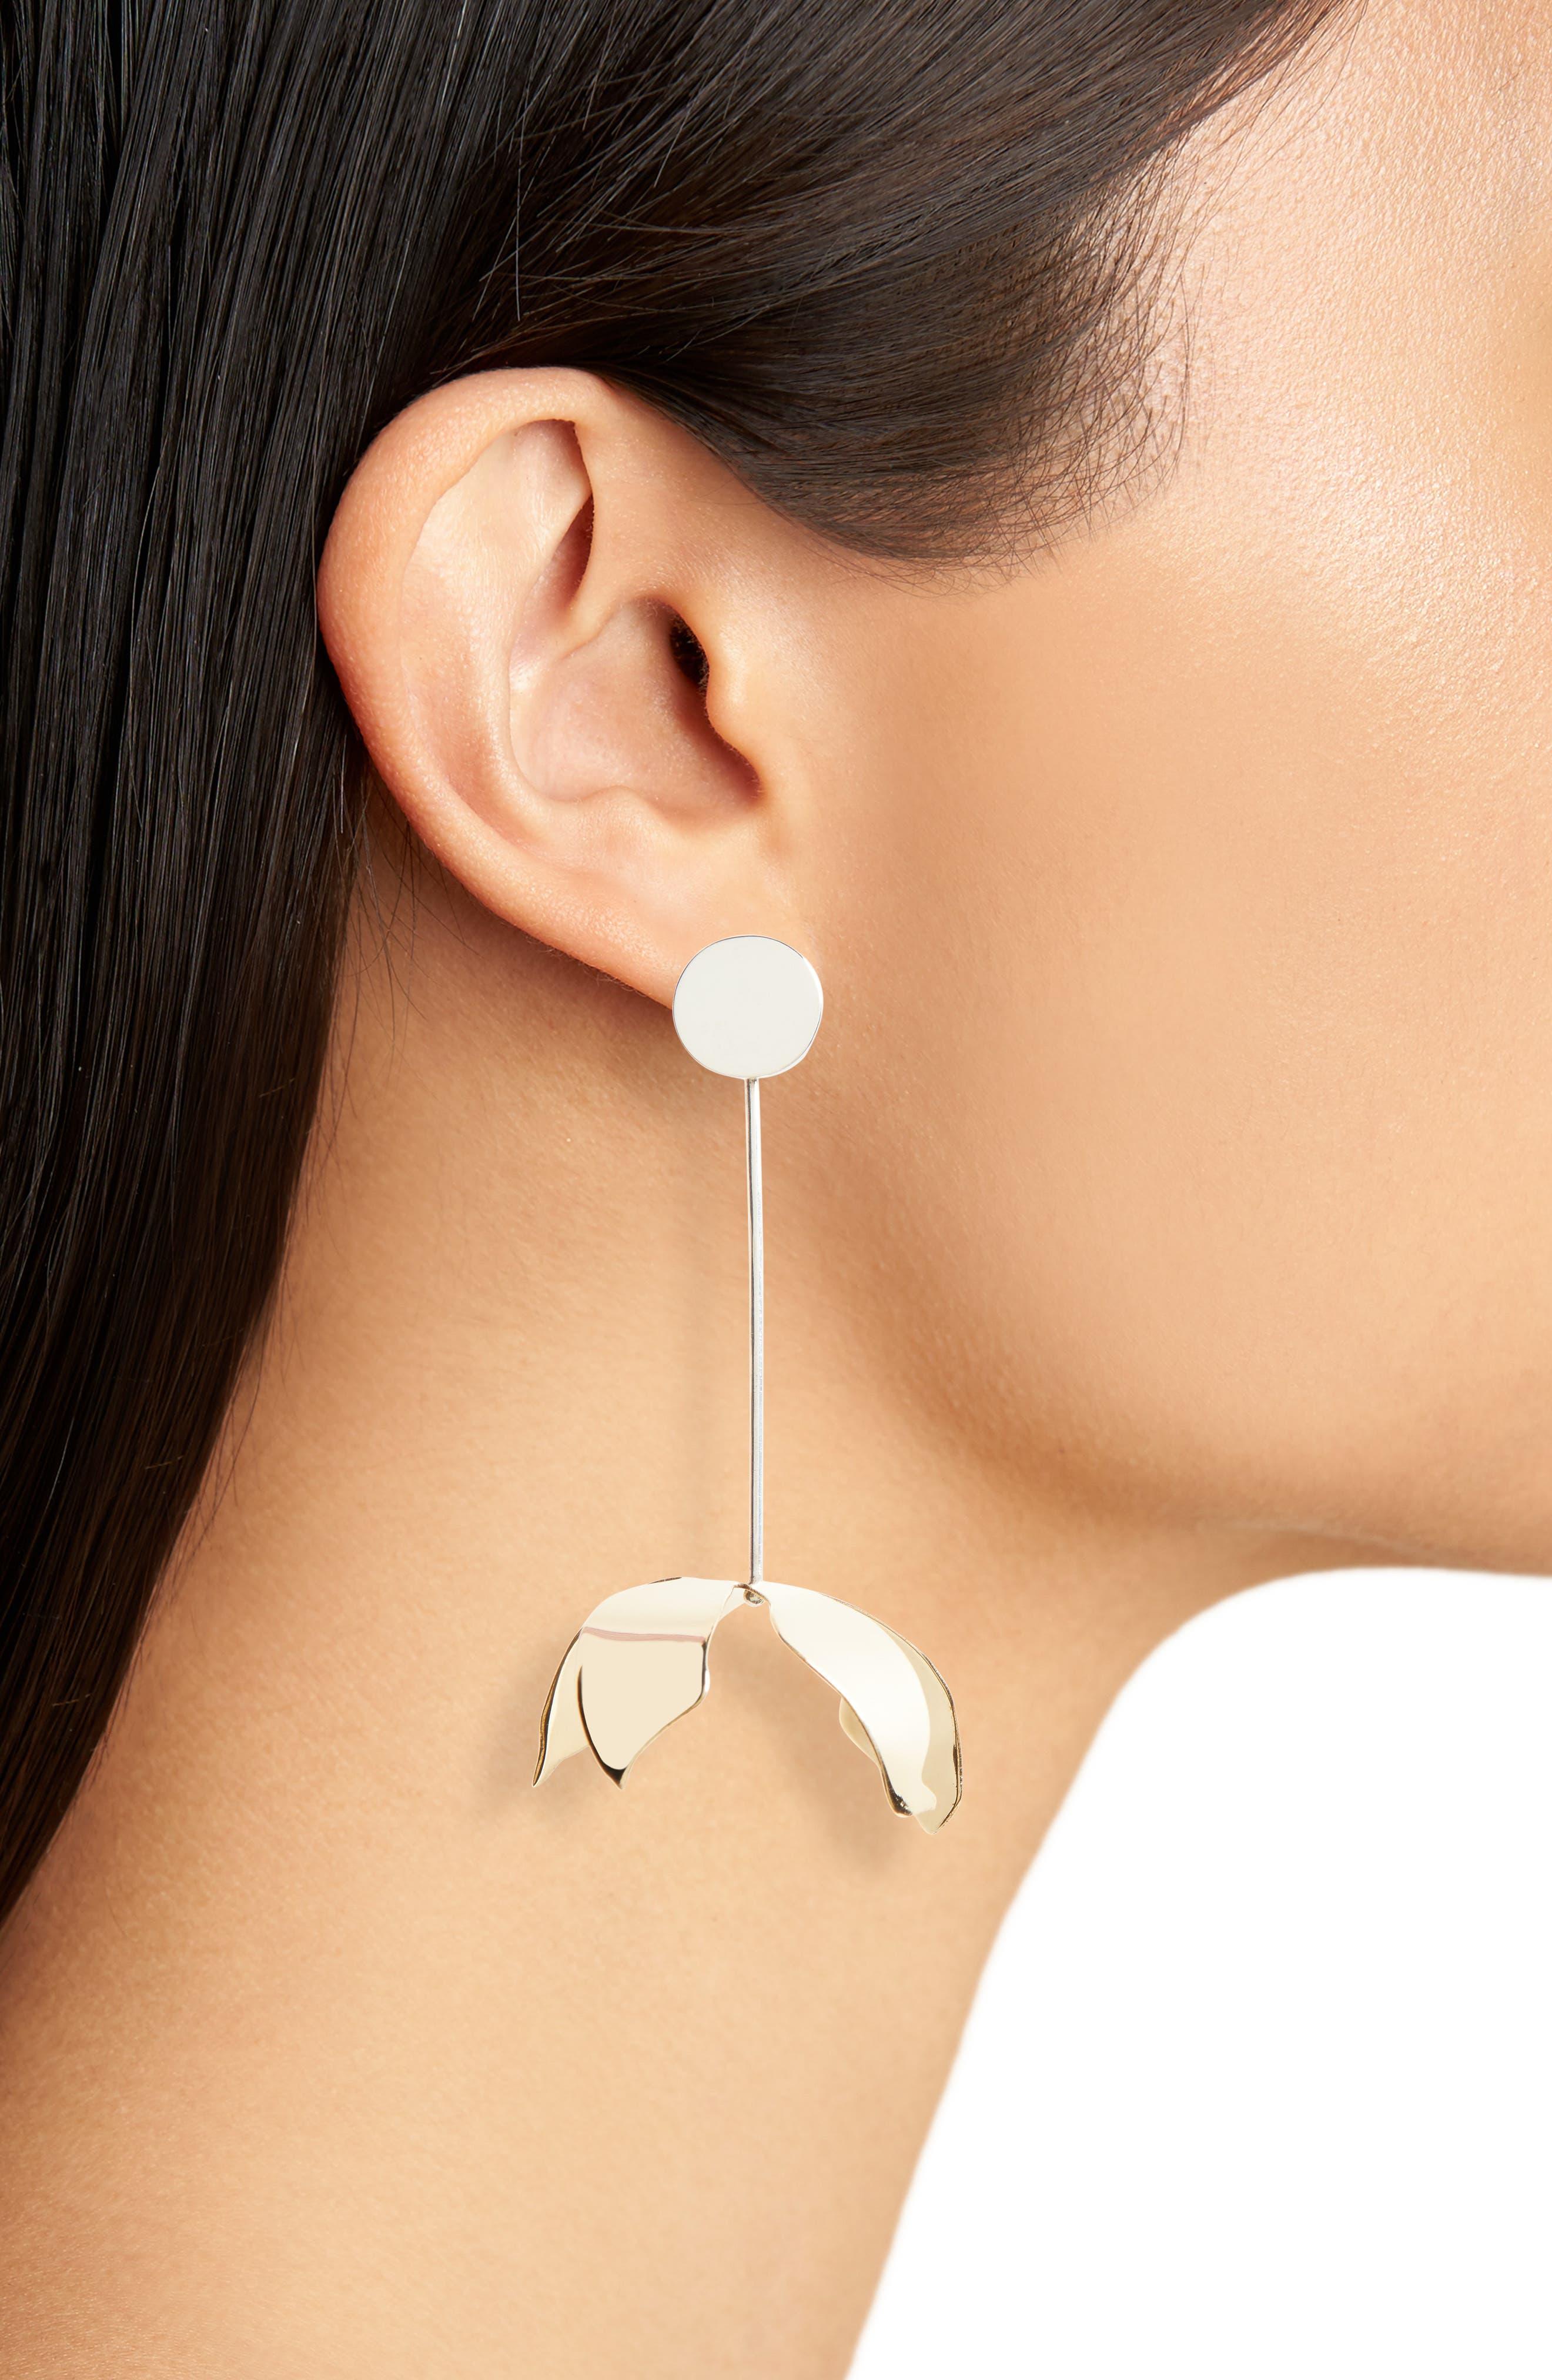 FARIS, Ladyday Linear Drop Earrings, Alternate thumbnail 2, color, SILVER/ BRONZE